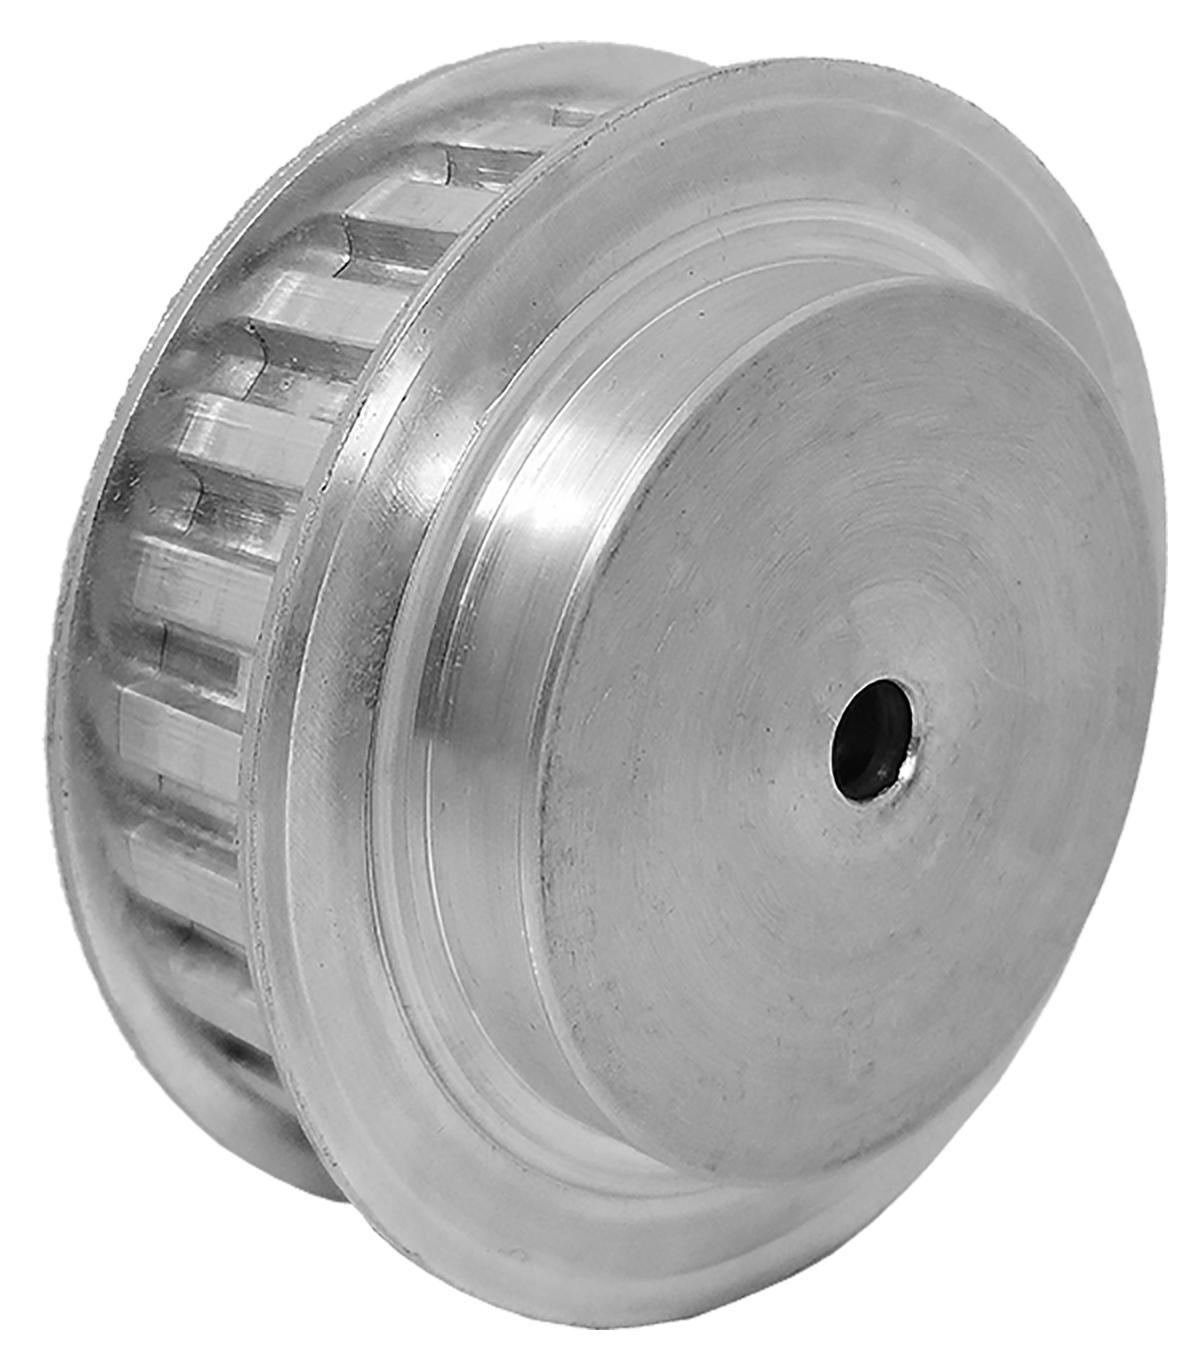 31T10/25-2 - Aluminum Metric Pulleys